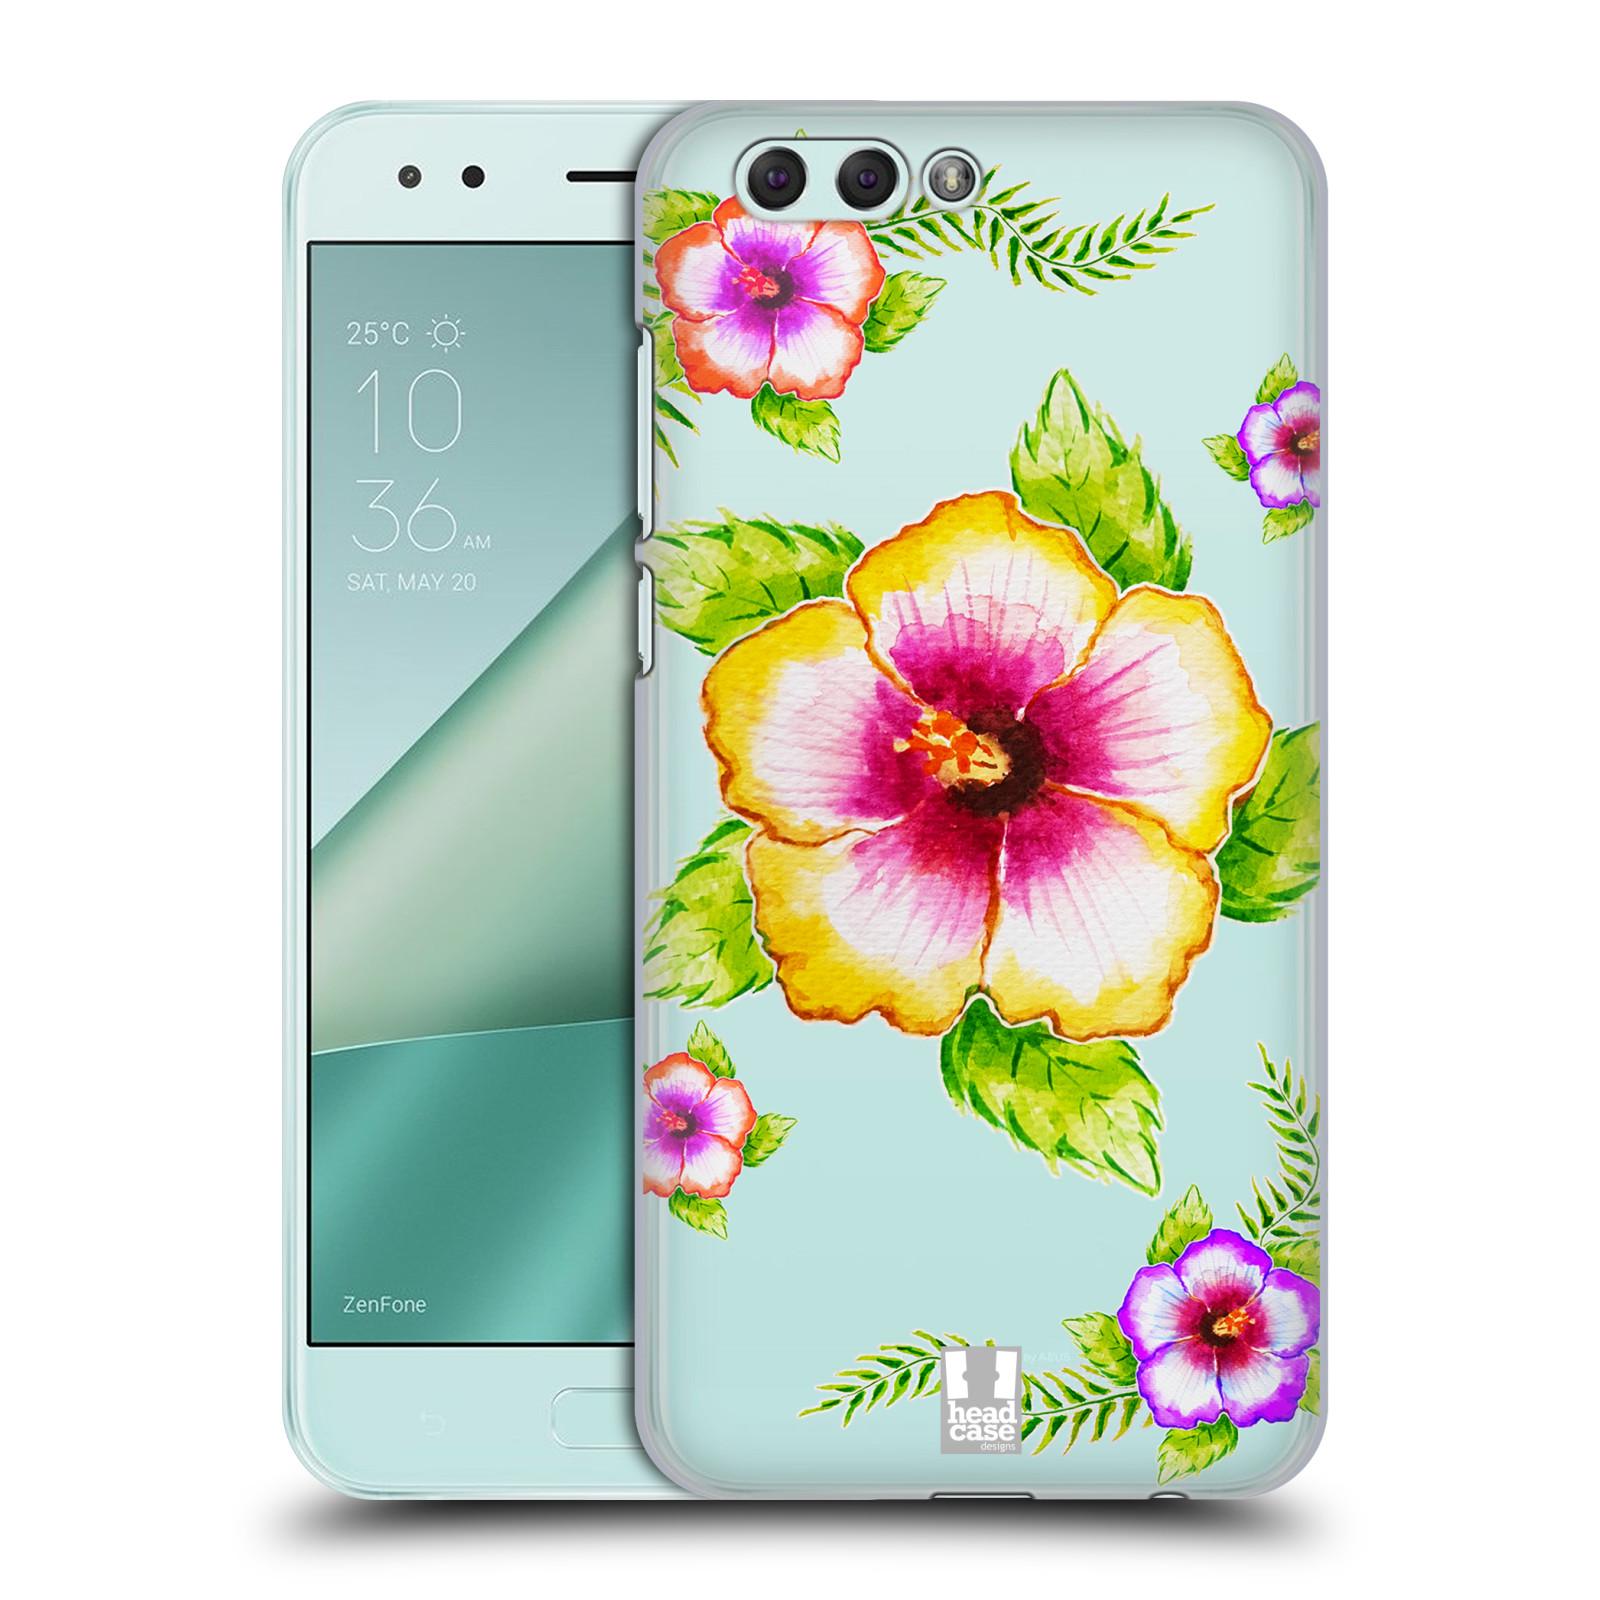 HEAD CASE plastový obal na mobil Asus Zenfone 4 ZE554KL Květina Ibišek vodní barvy